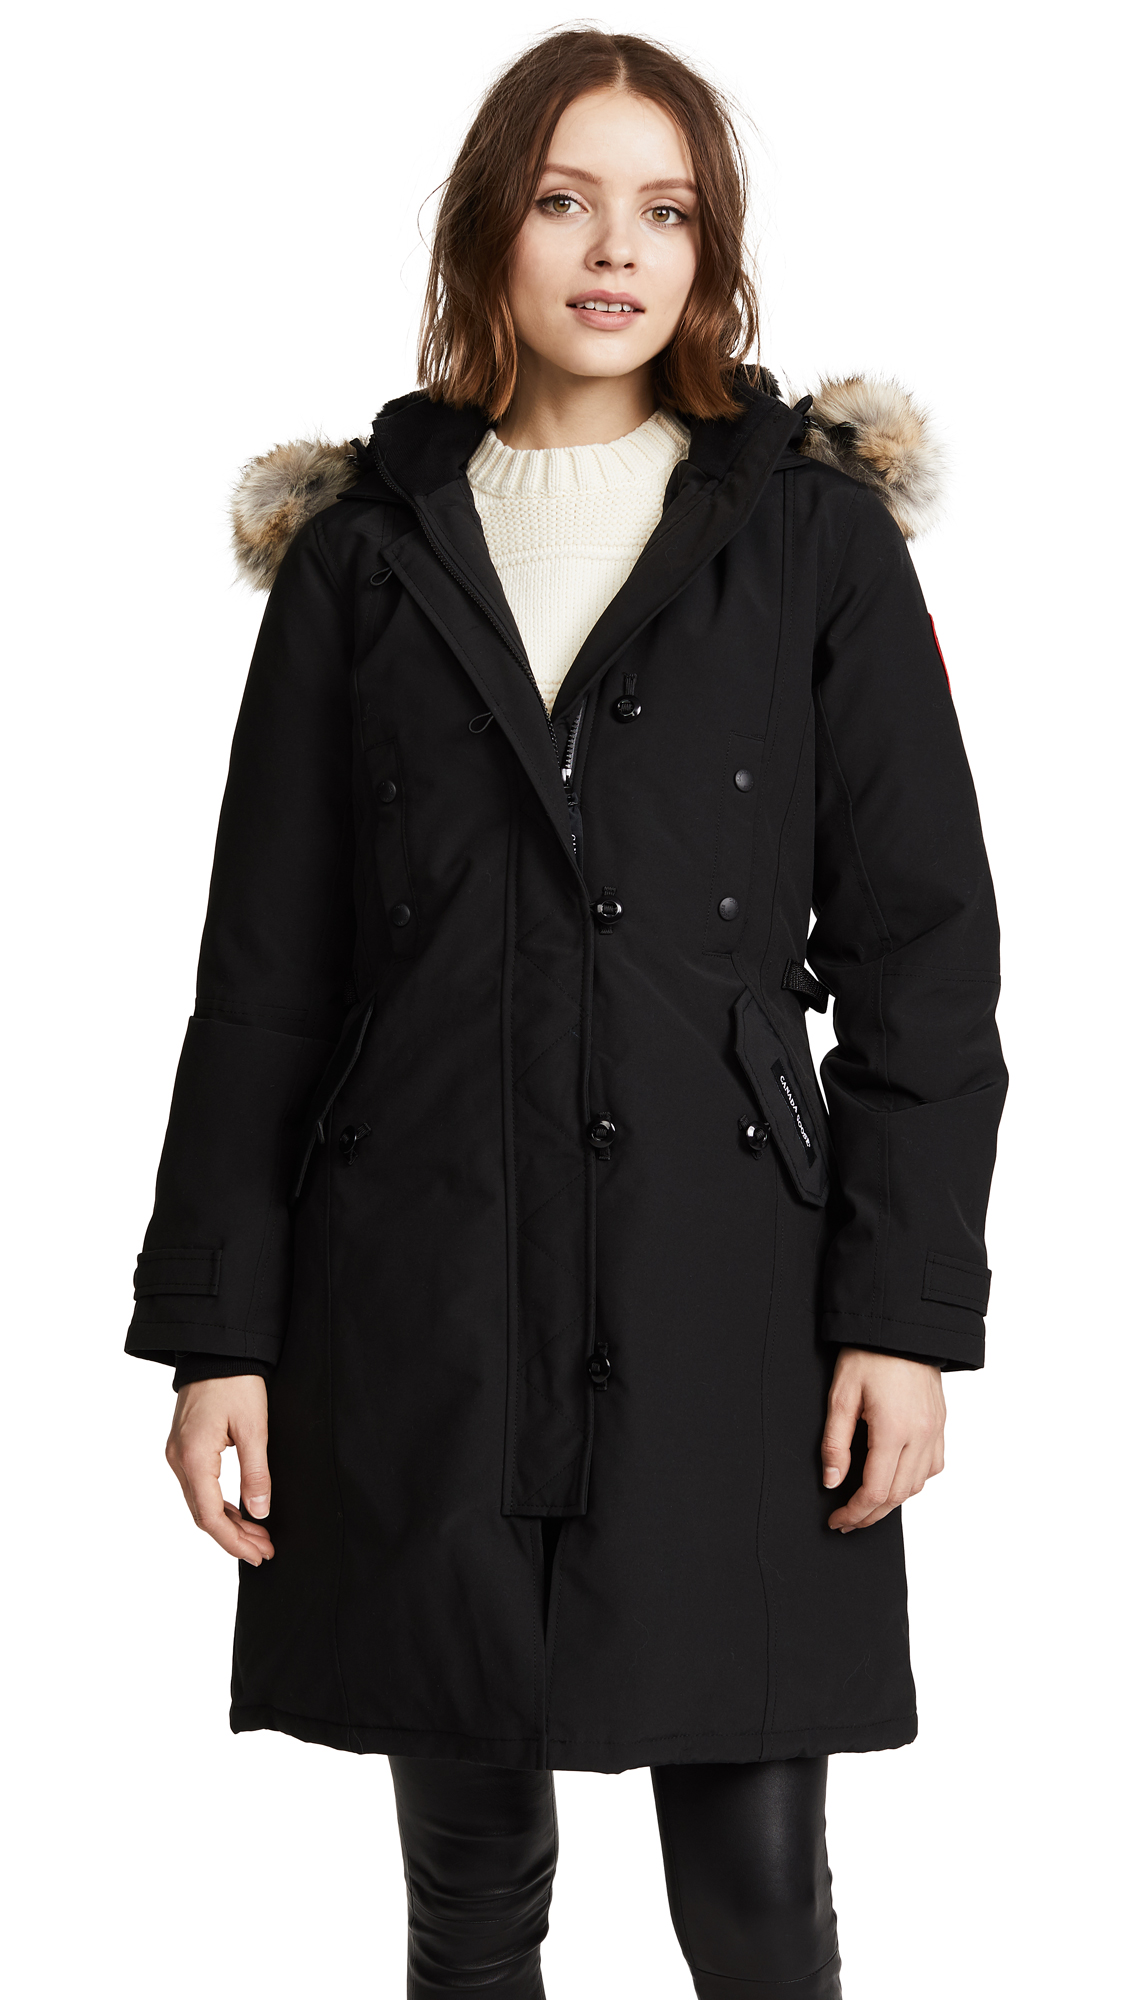 Canada Goose Kensington Parka - Black